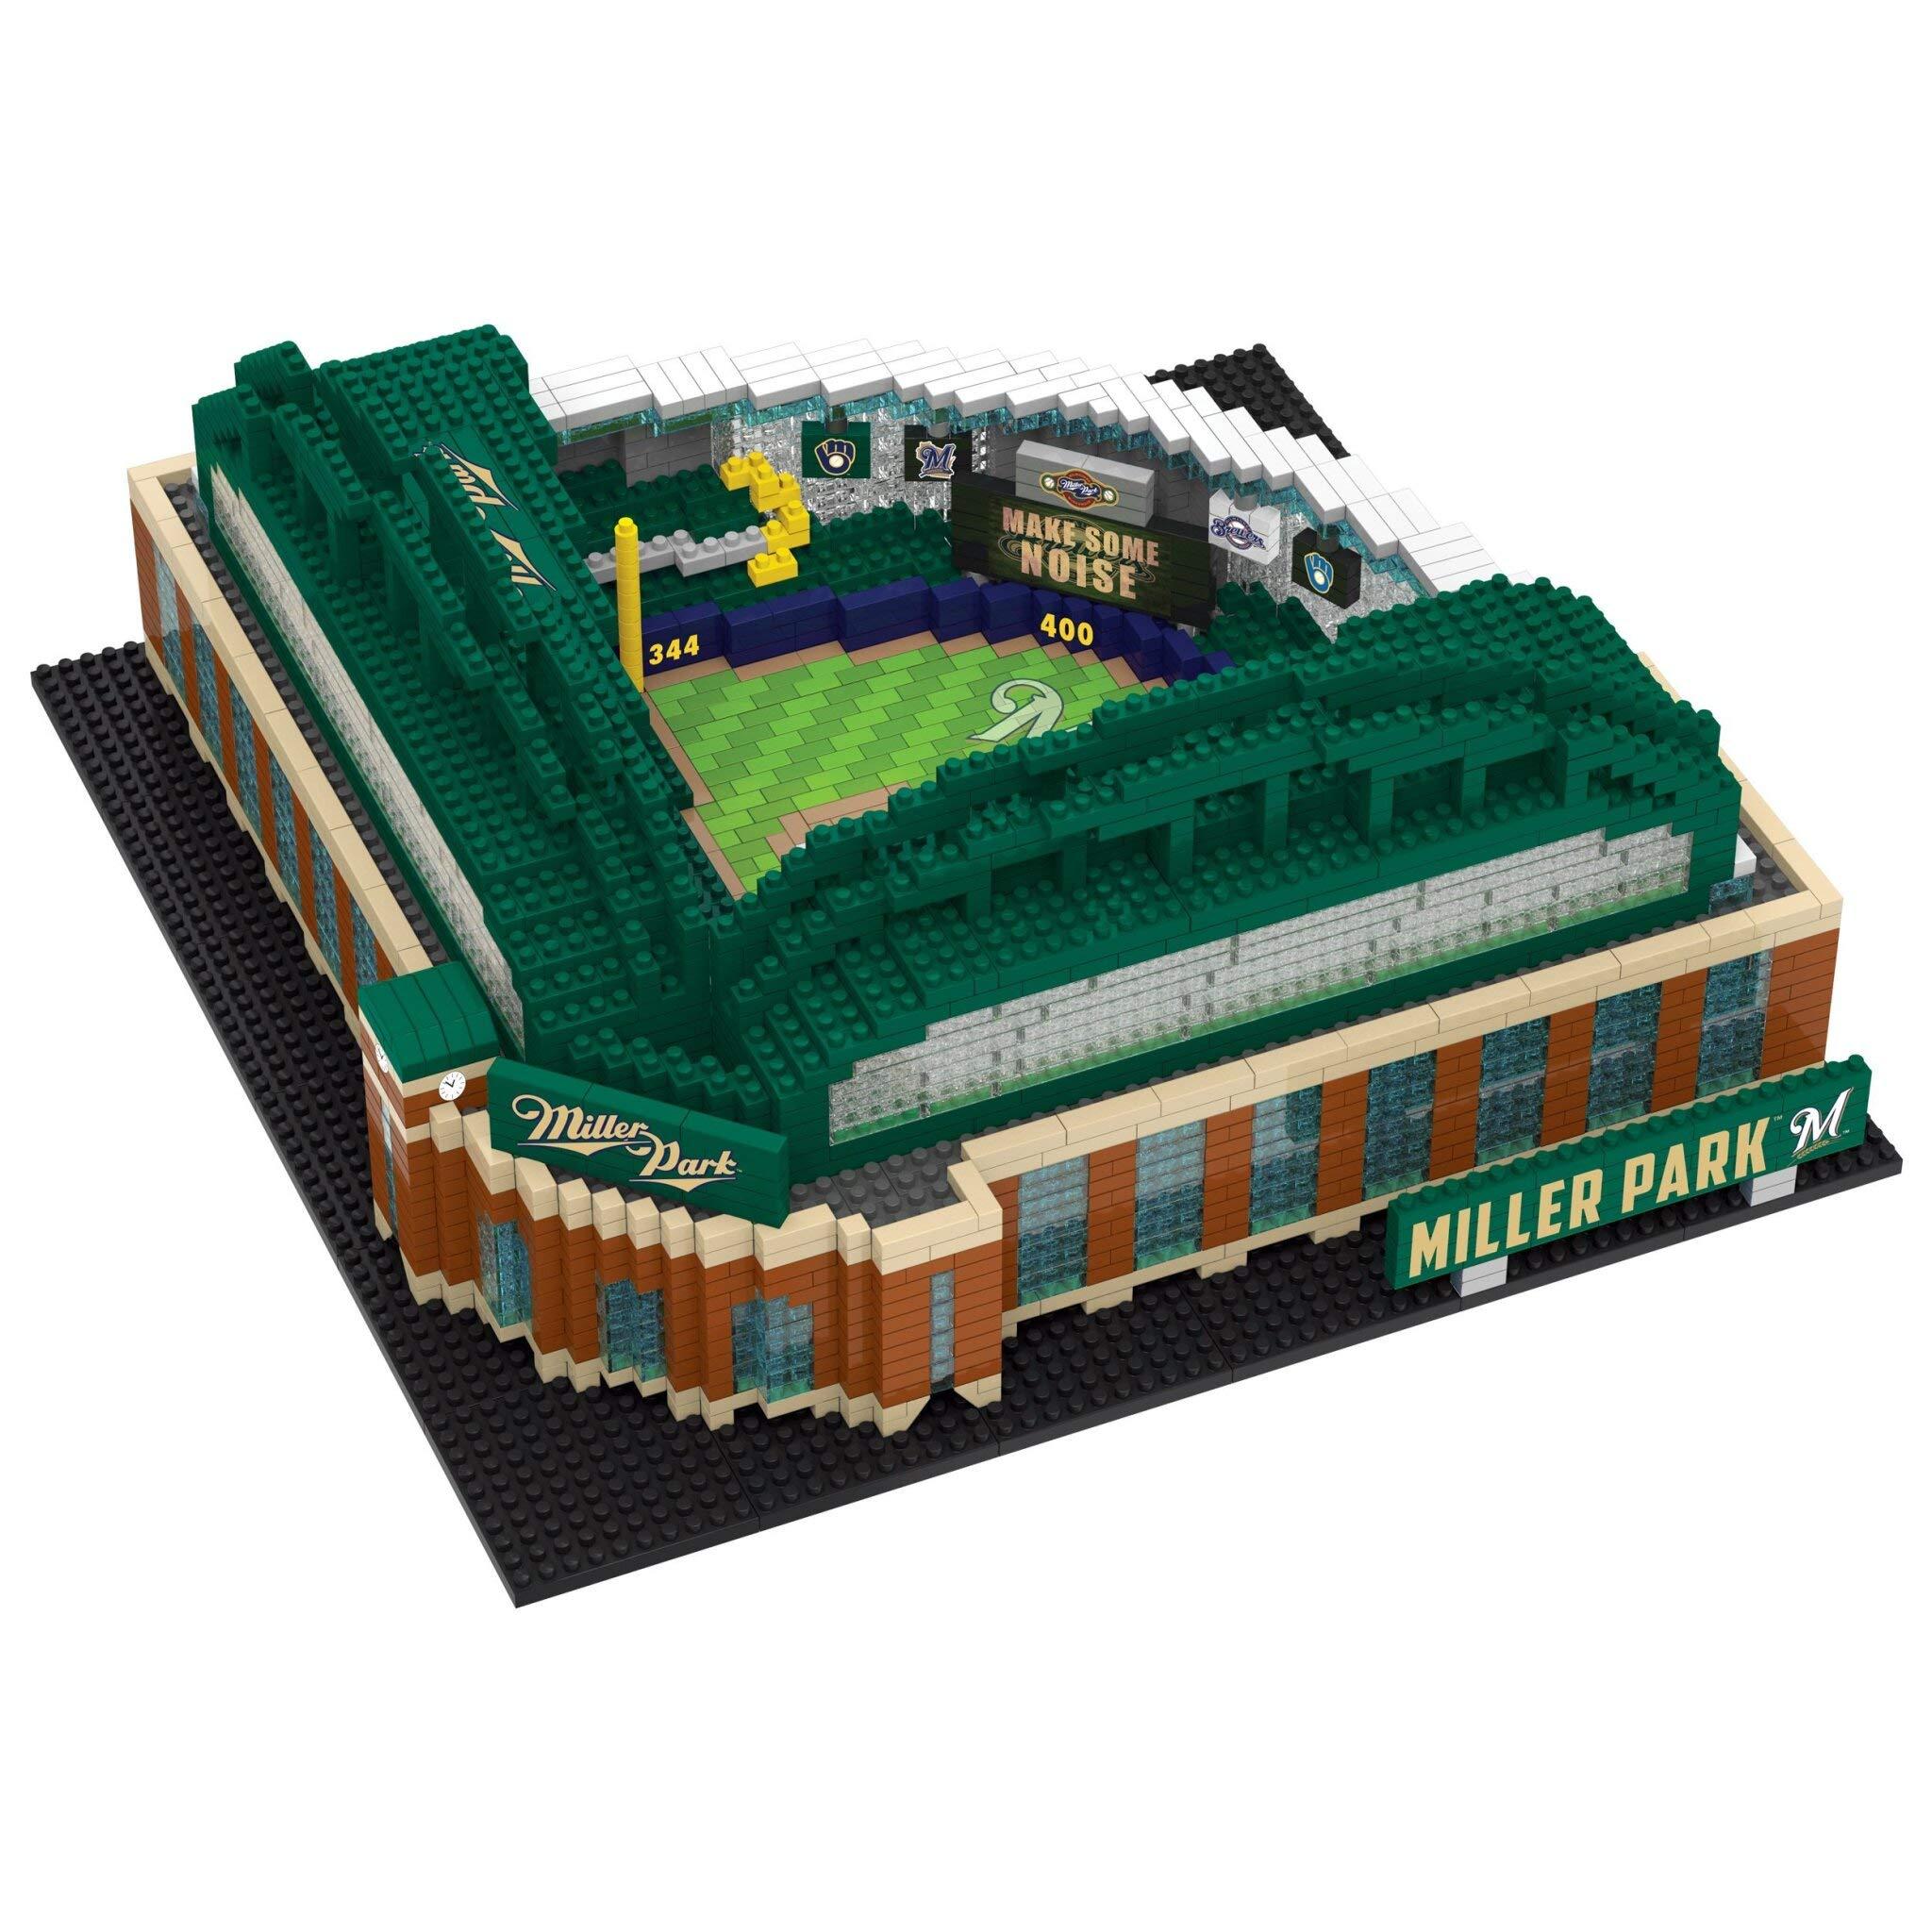 STADIUM3D Brxlz One Size Stadium FOCO MLB New York Yankees Unisex 3D Brxlz Team Color